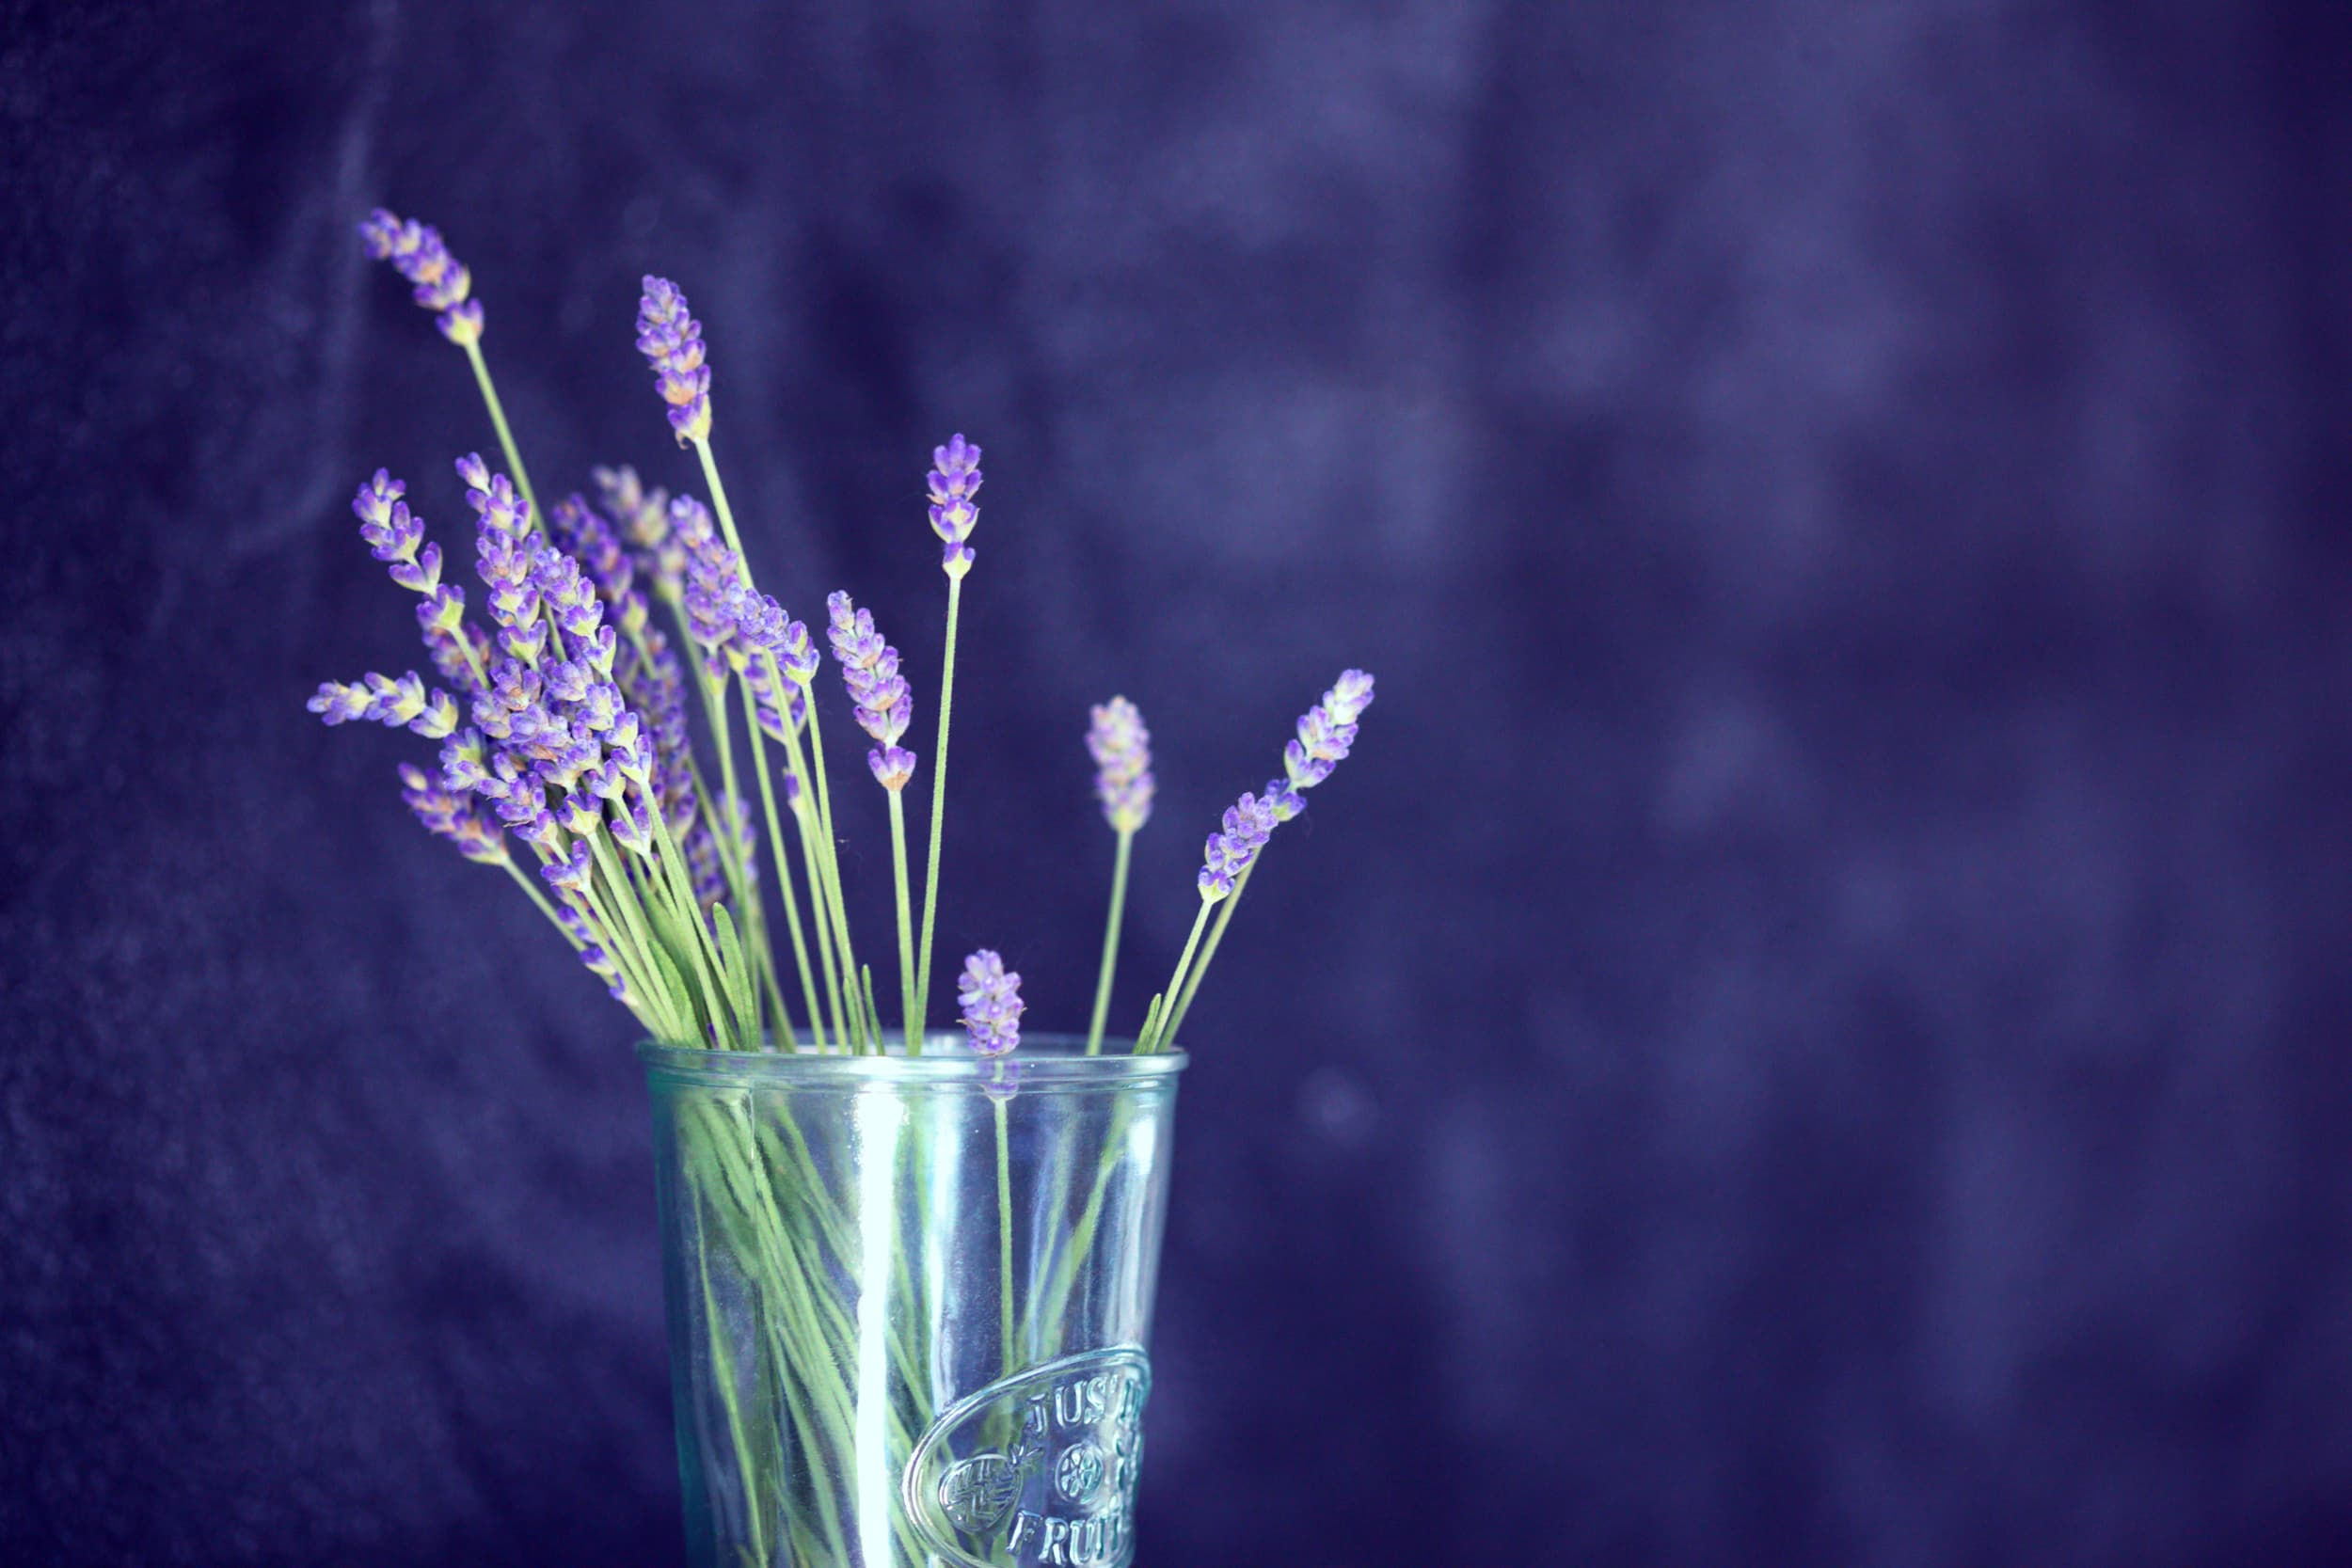 Lavender With Fish Jersey Lavender Farm Blog Post